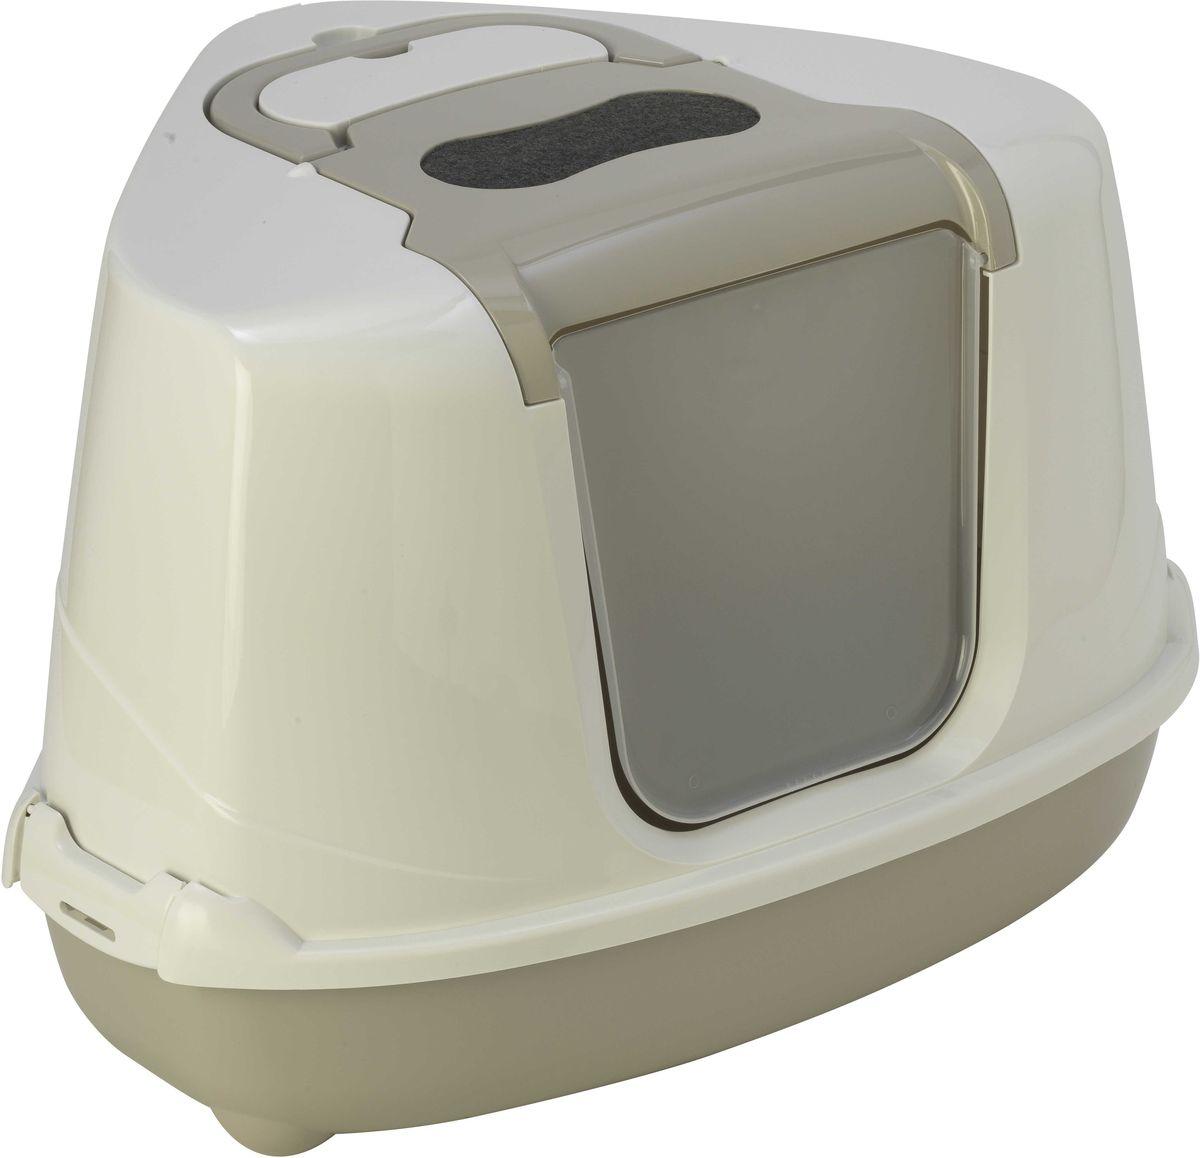 Туалет угловой закрытый для кошек Moderna Flip Corner, цвет: светло-серый, 56 х 45 х 39 см14C250330